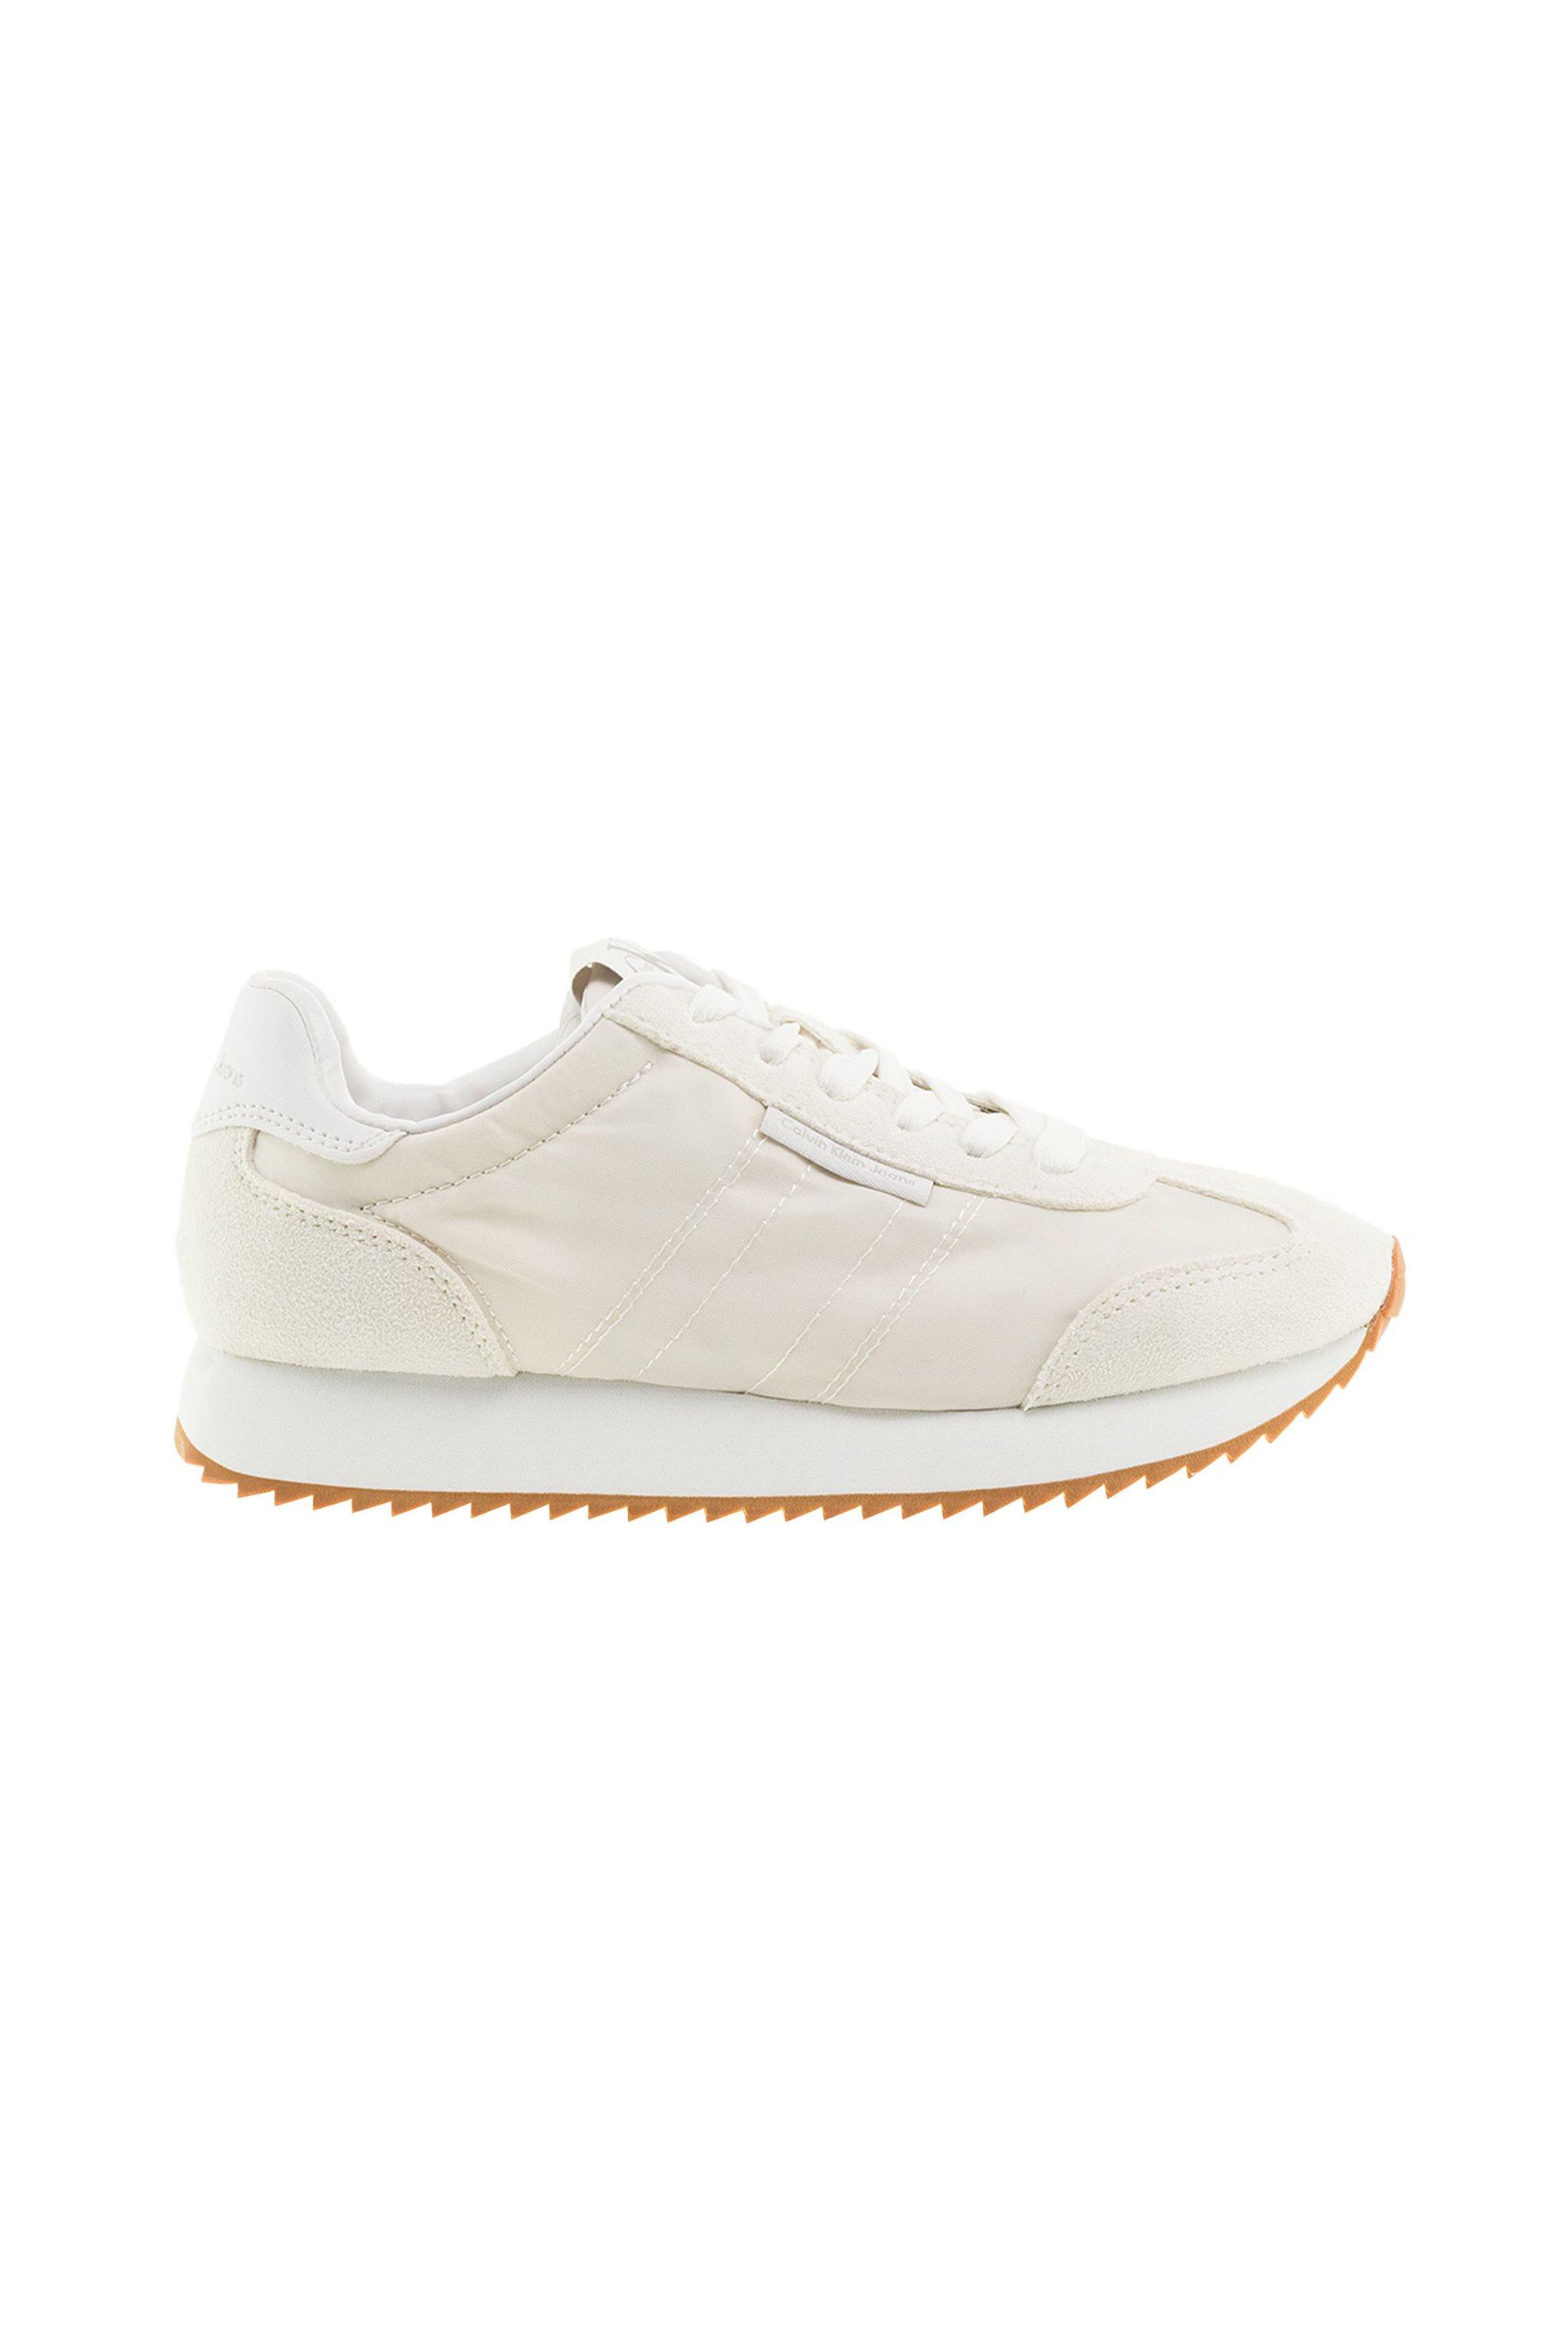 875bcef3a9b GoldenShopping.gr - Γυναικεία > Παπούτσια